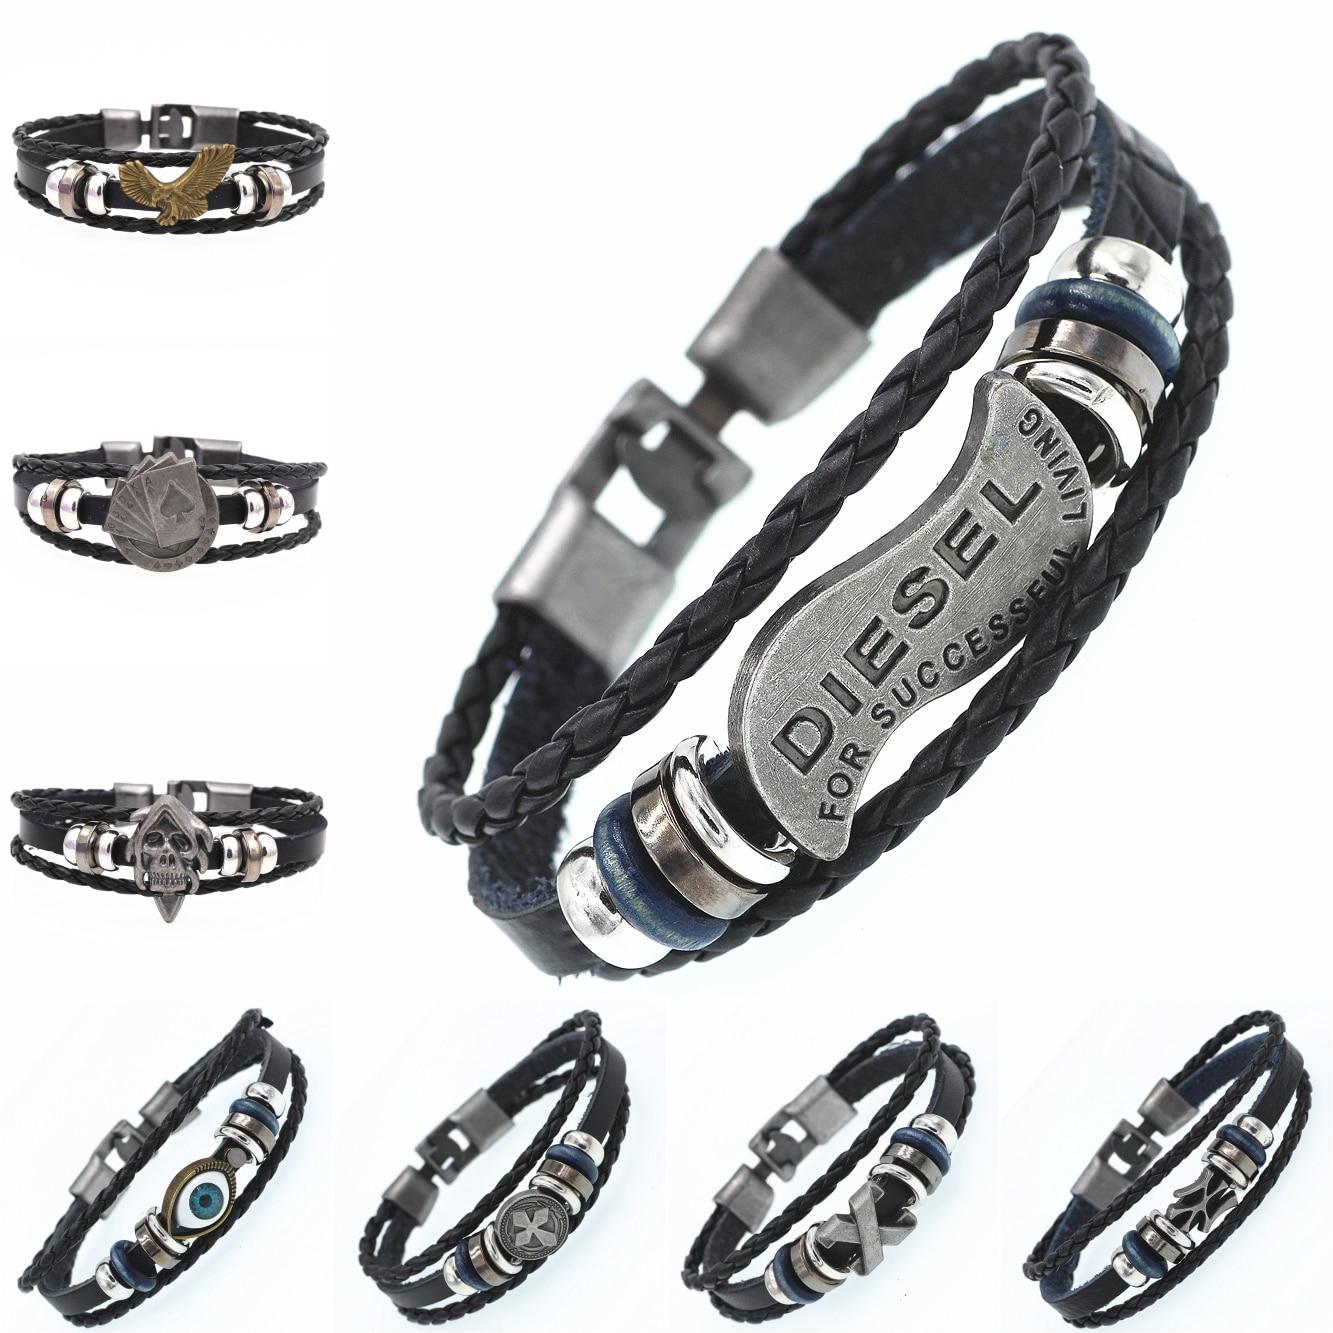 DGW Braided Wrap Leather Bracelets for Men Vintage Life Tree Rudder Charm Wood Beads Ethnic Tribal Wristbands